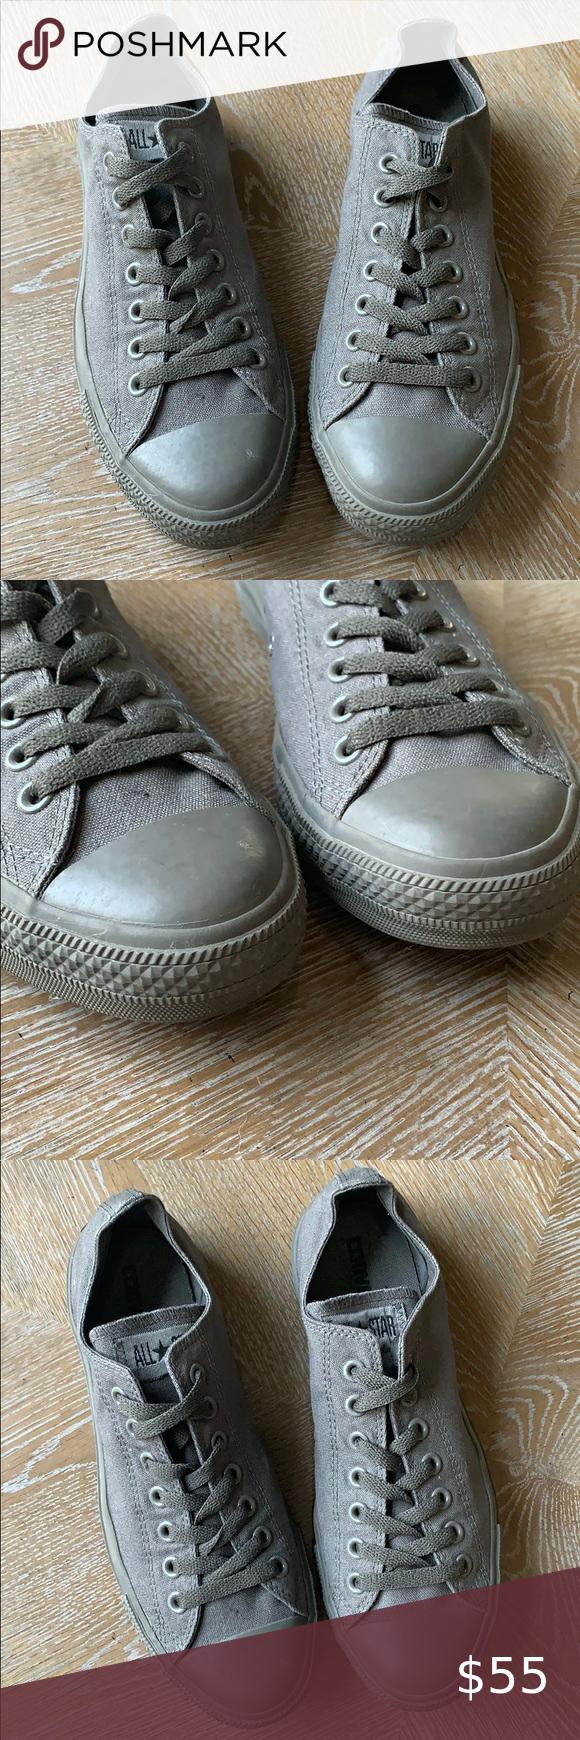 Star sneakers, Converse men